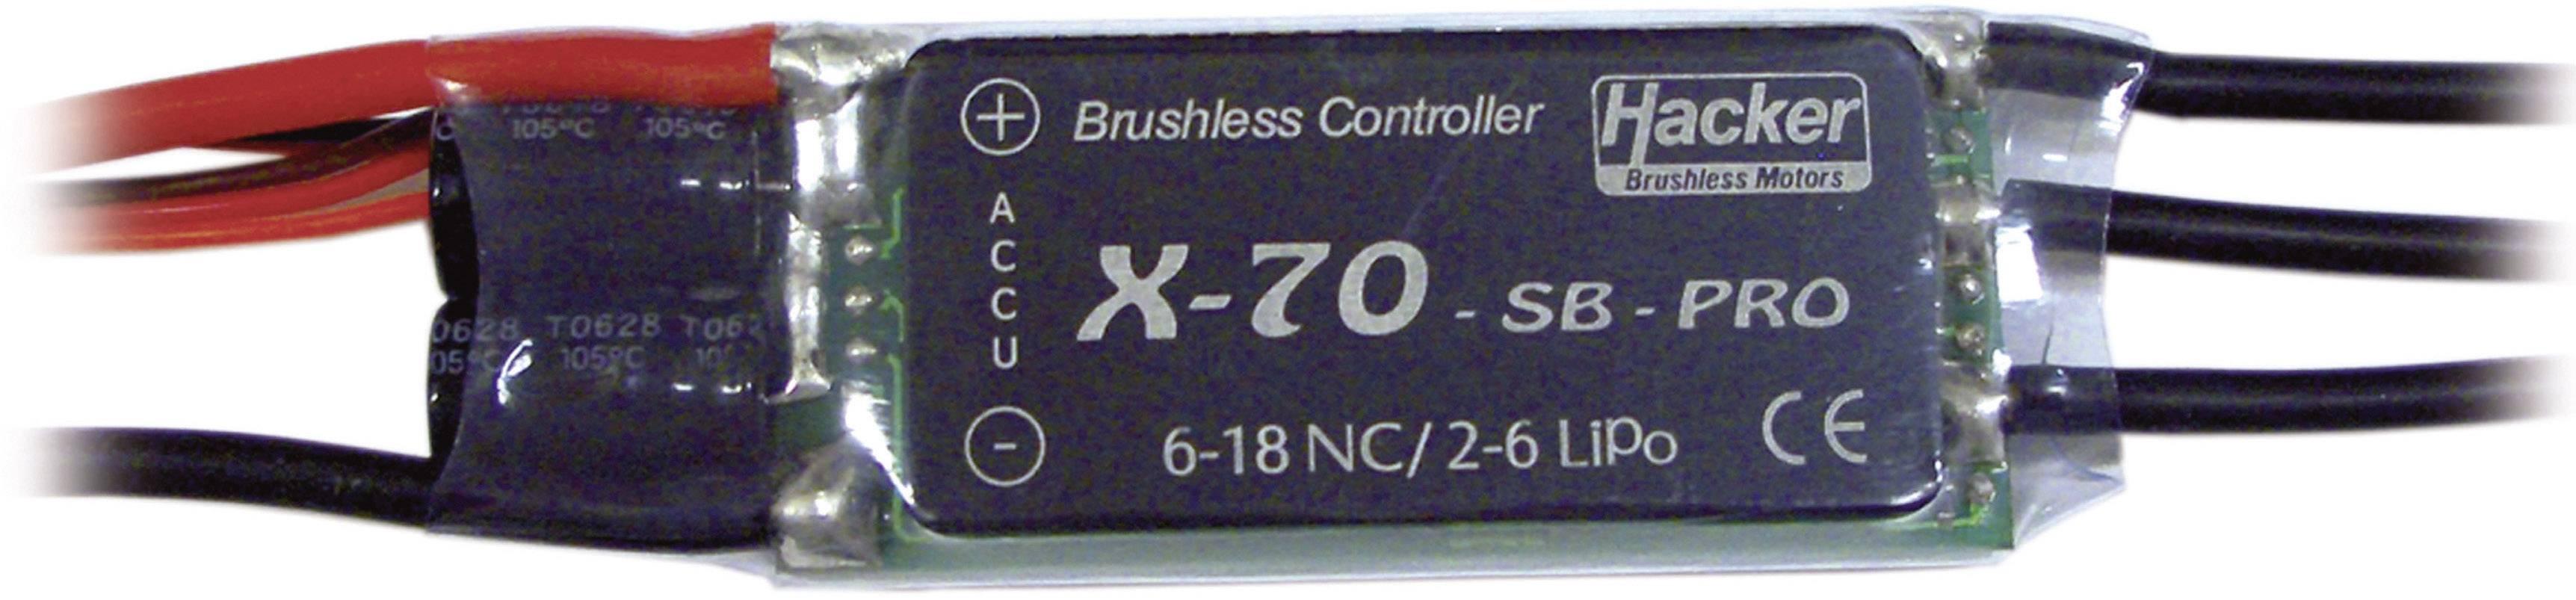 Brushless letový regulátor pre model lietadla Hacker X-70-SB-Pro BEC